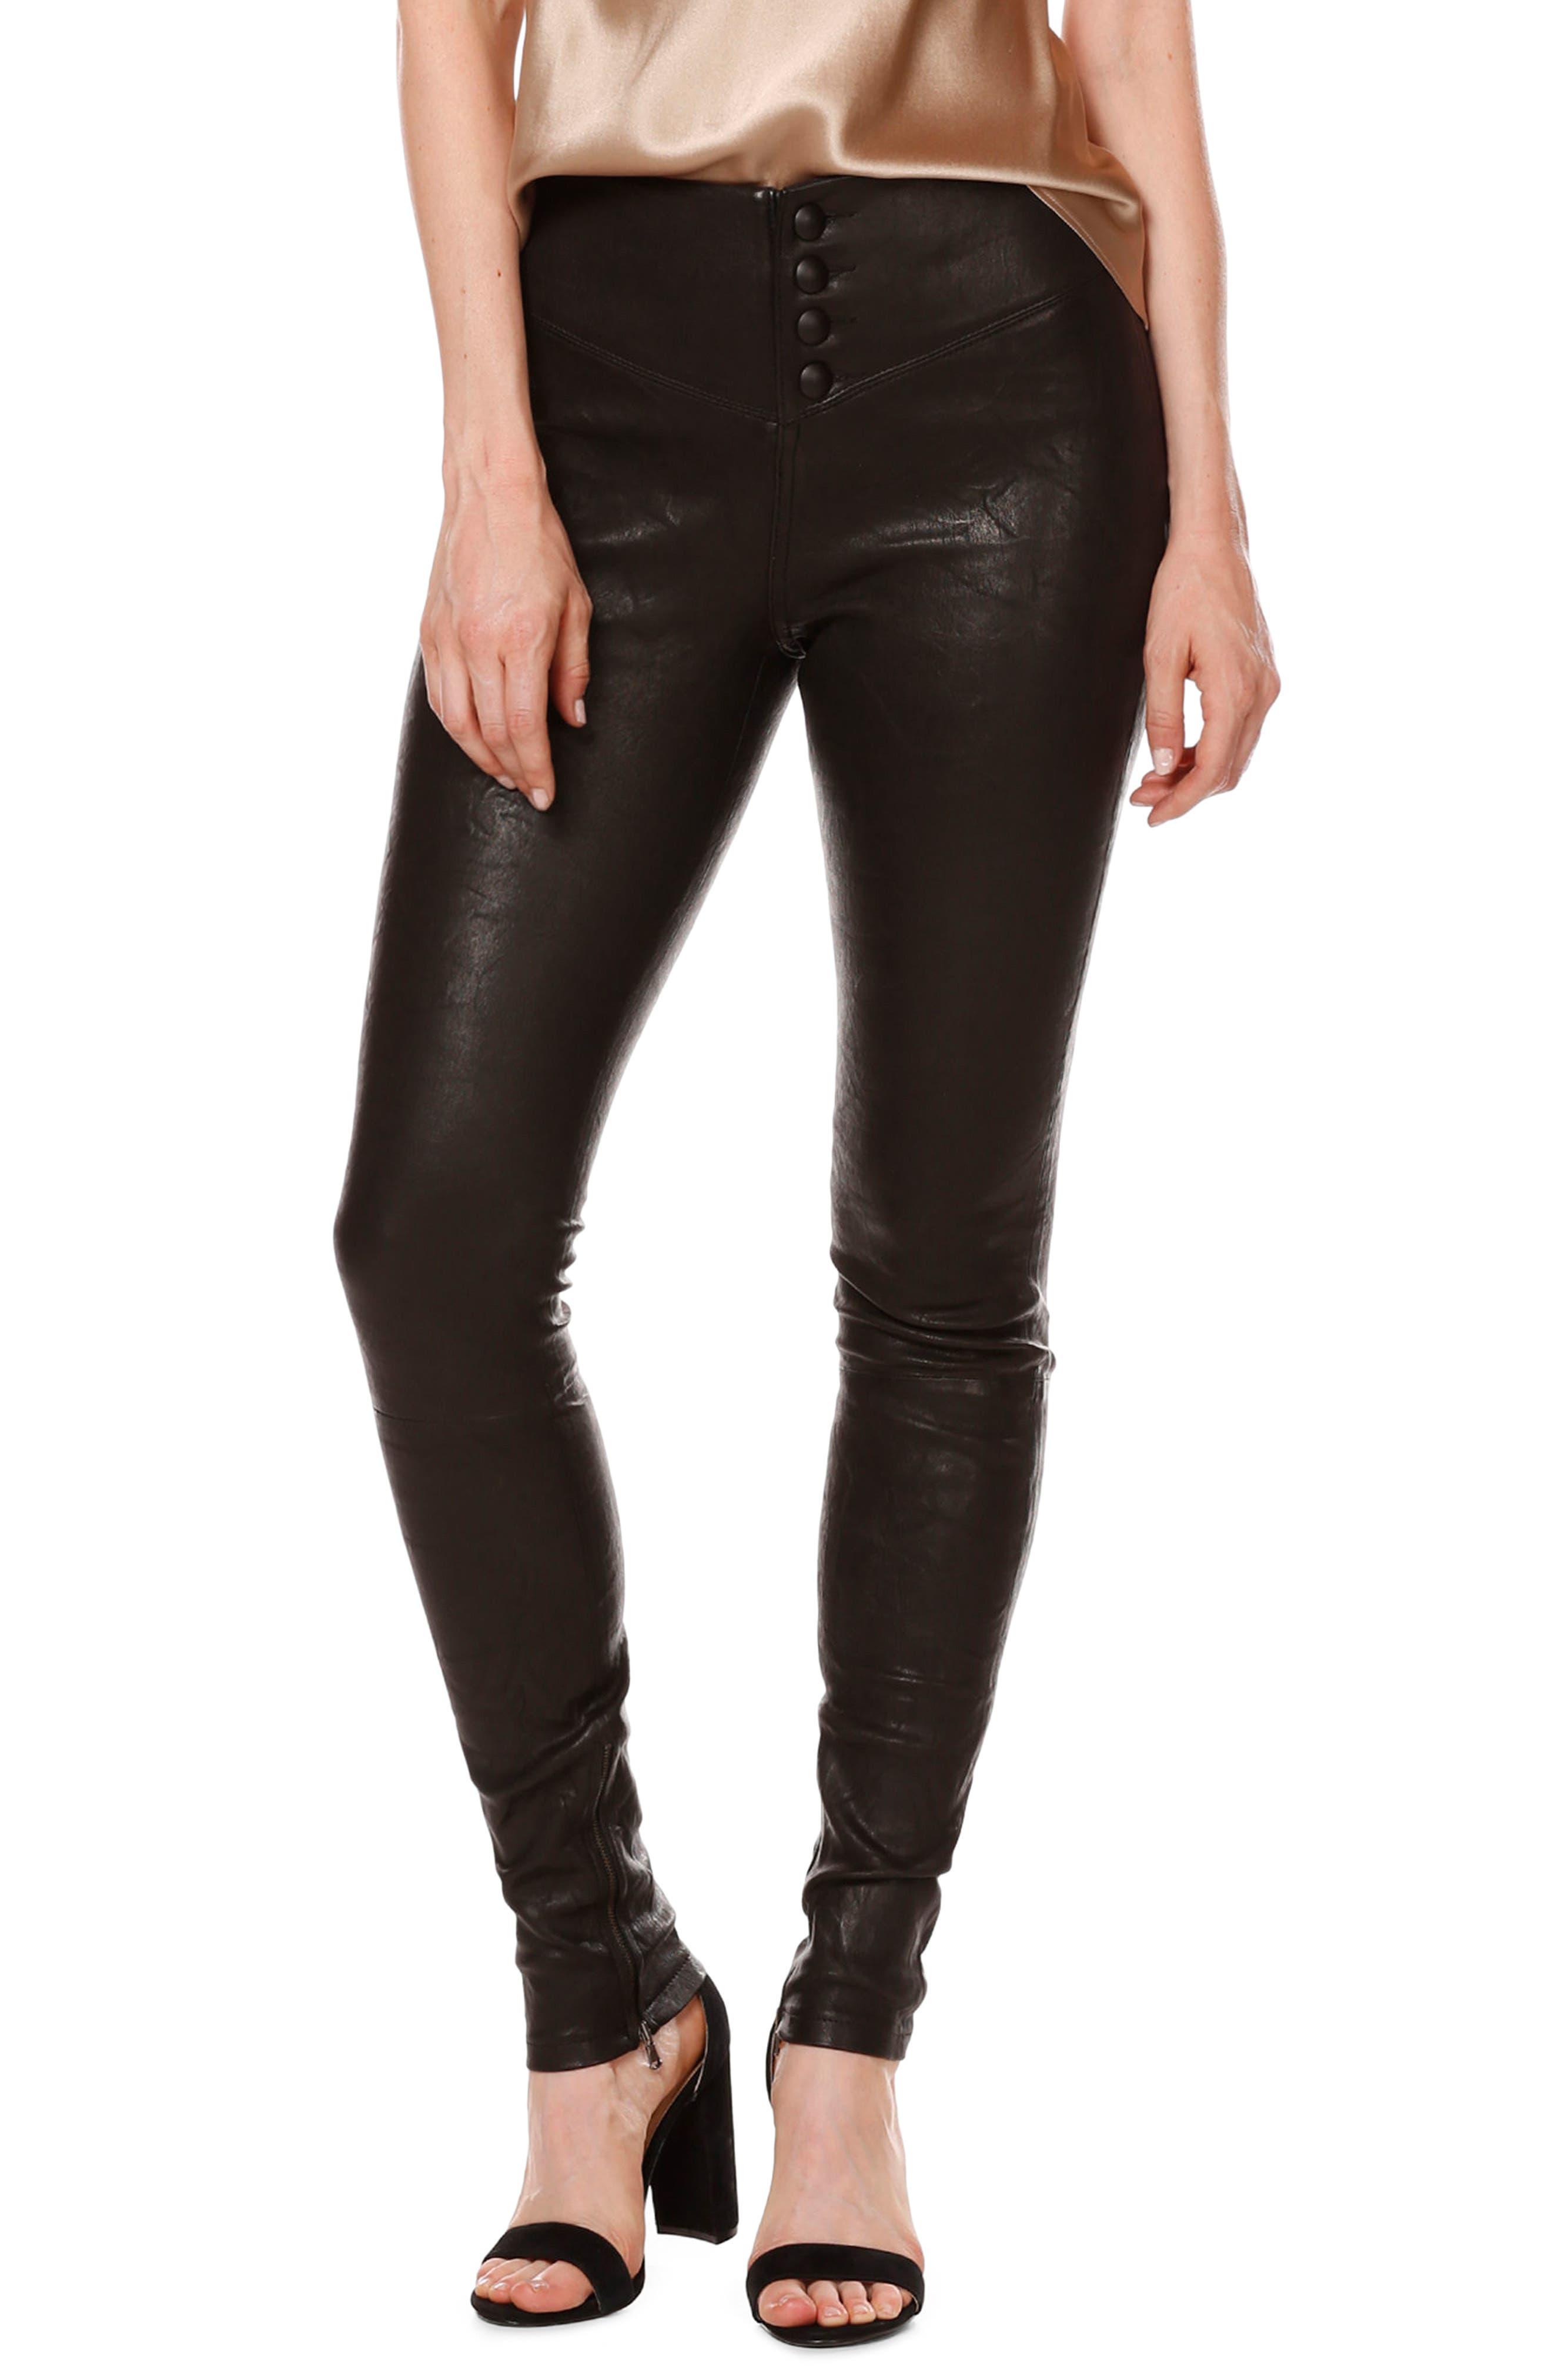 Rosie HW x PAIGE Ellery Ankle Zip Leather Pants,                             Alternate thumbnail 4, color,                             001